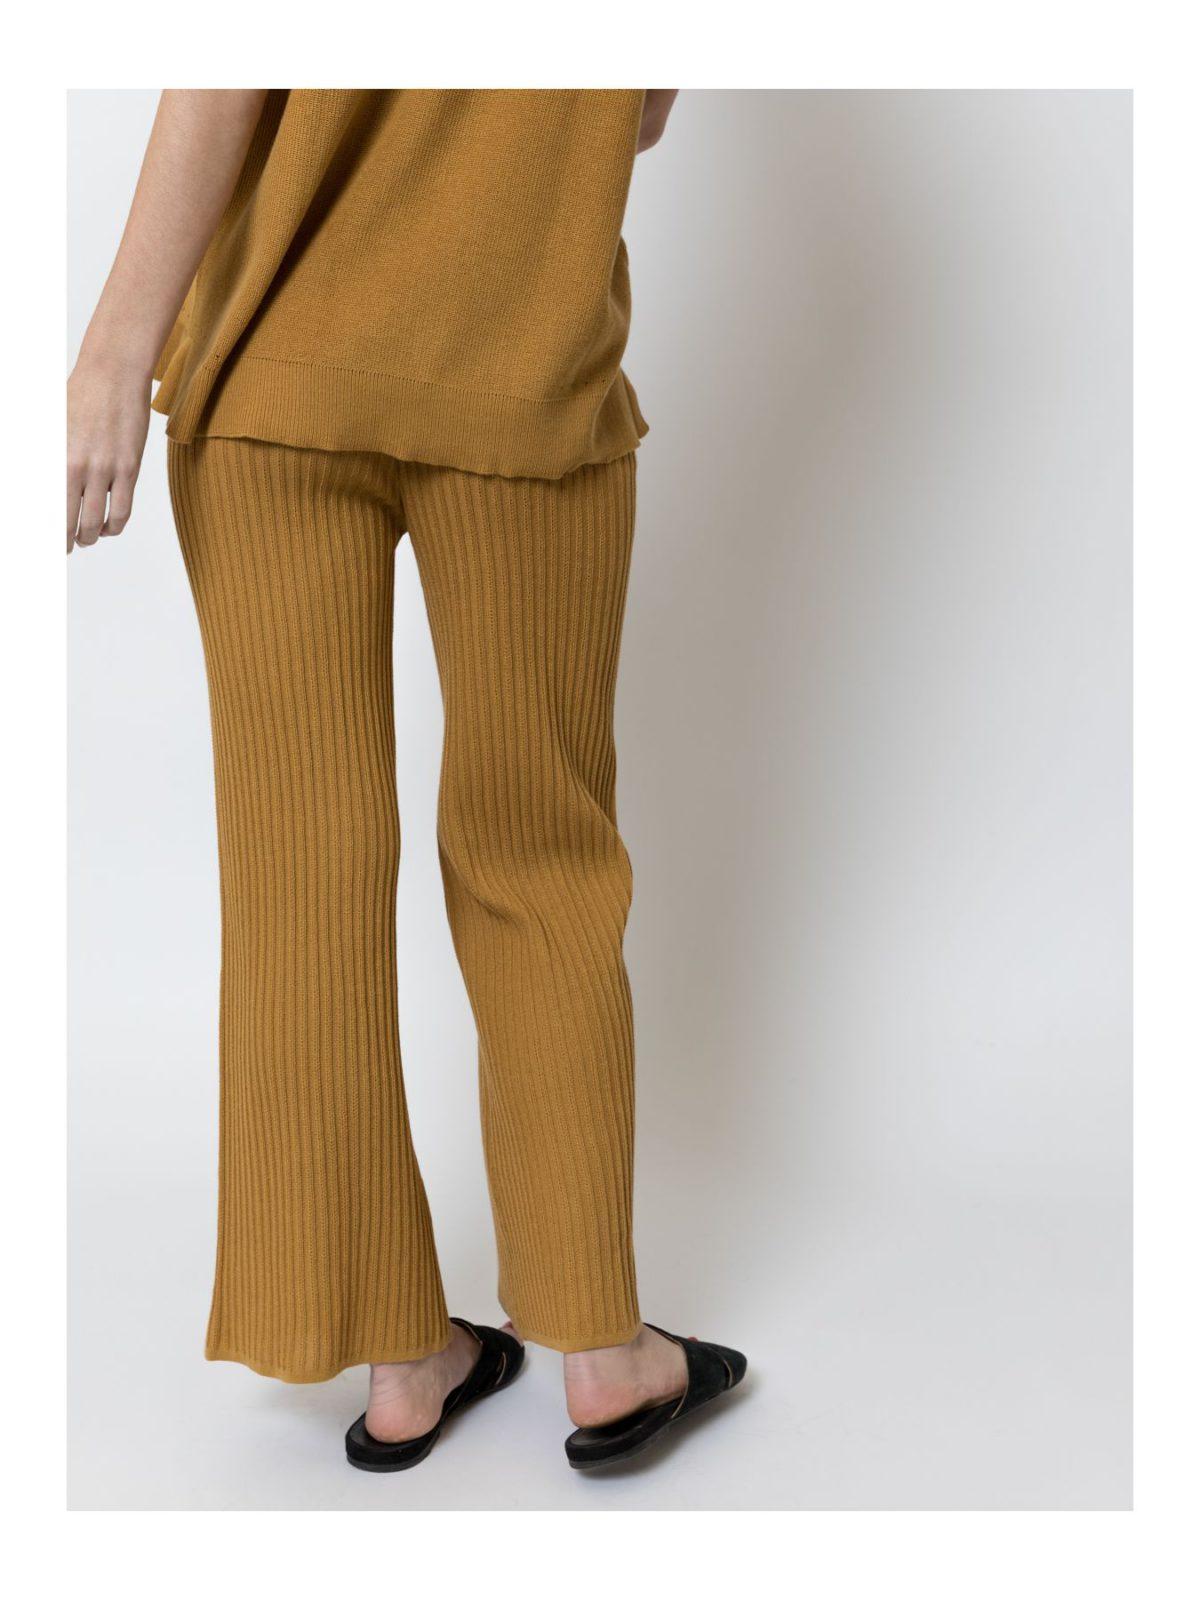 comfy-caroline-trousers-gold-2